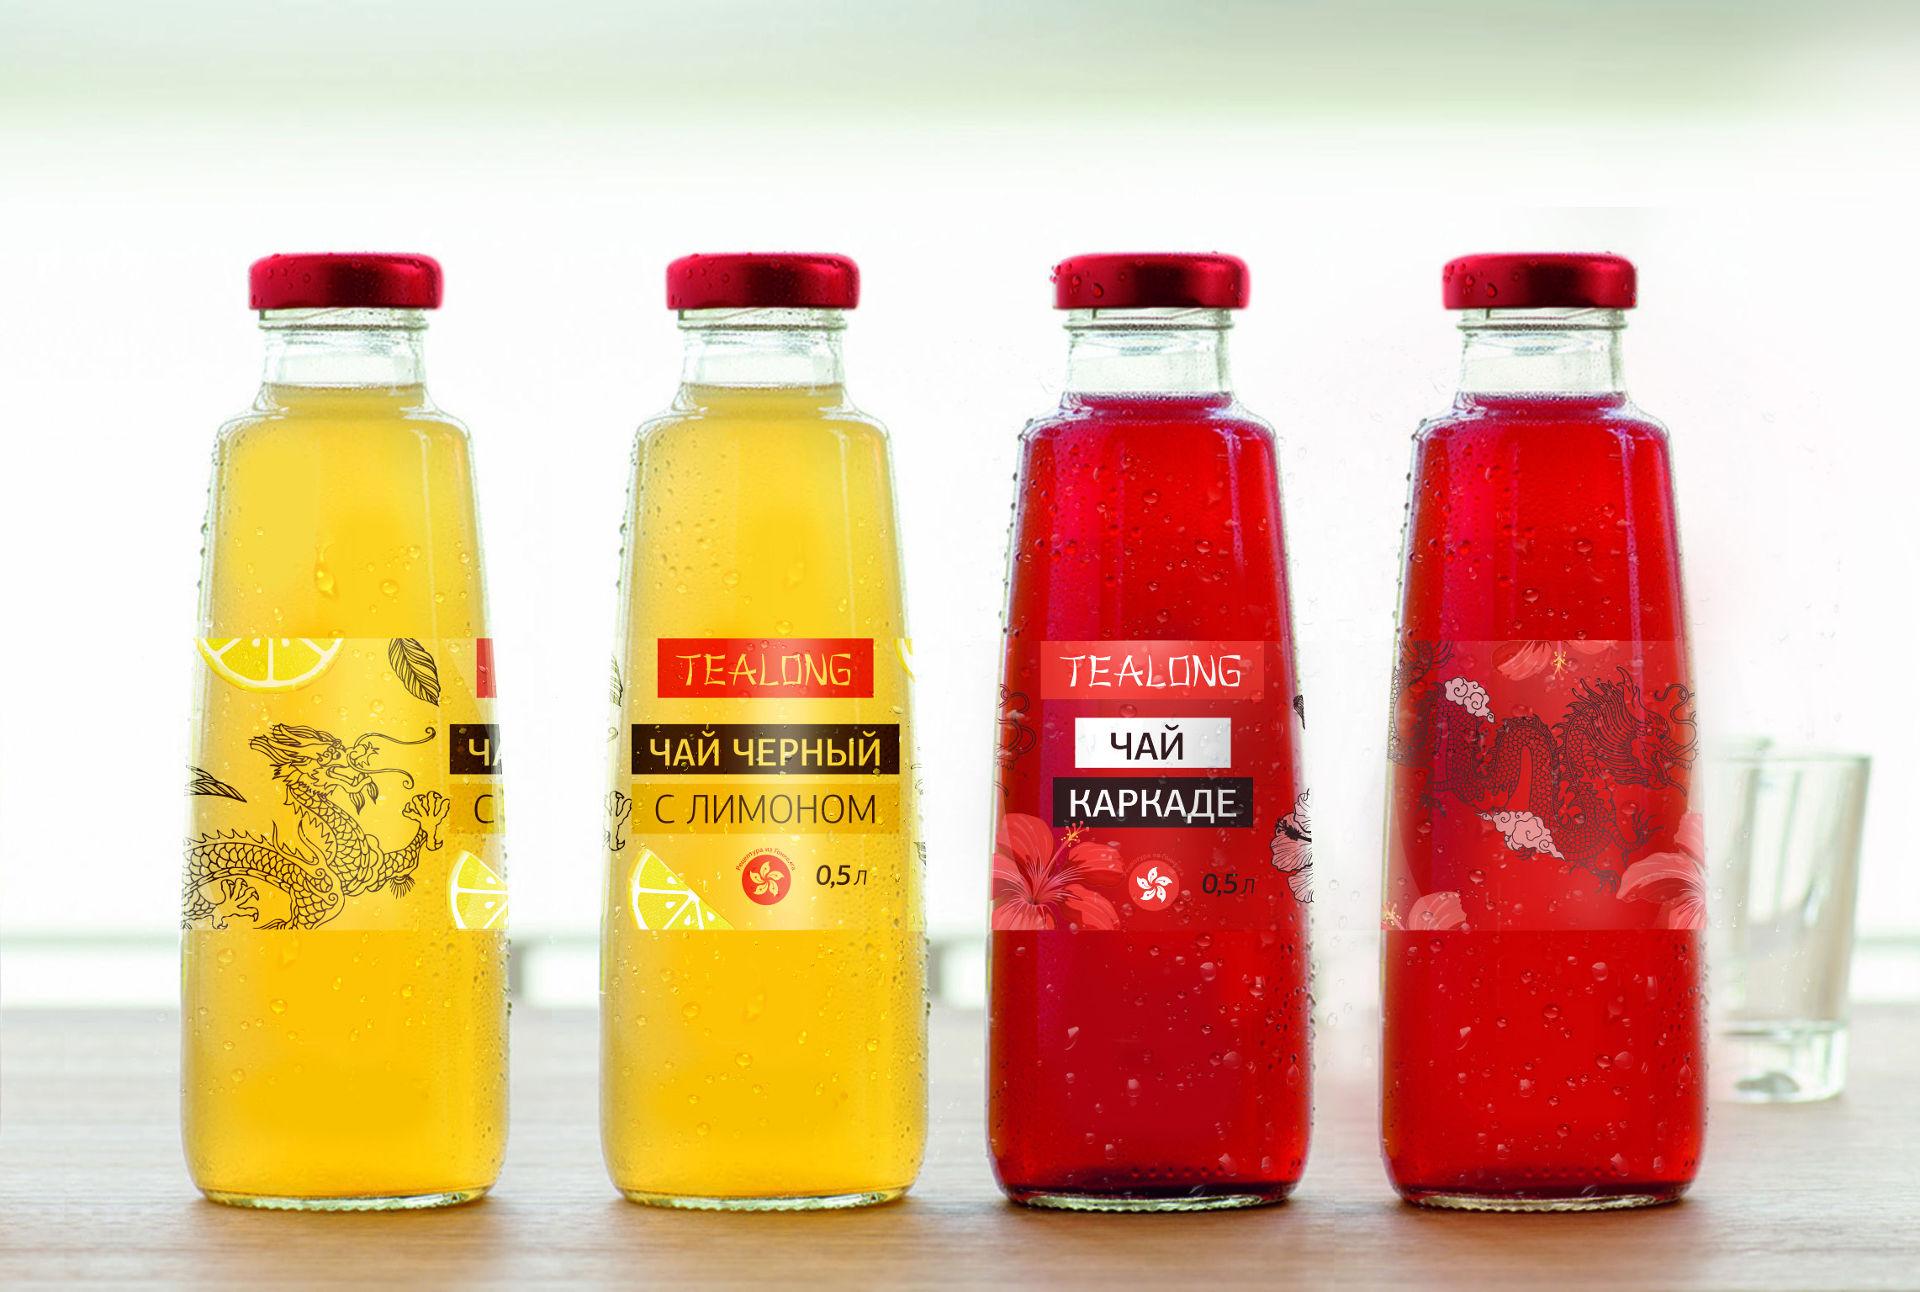 ice tea bottle lable design